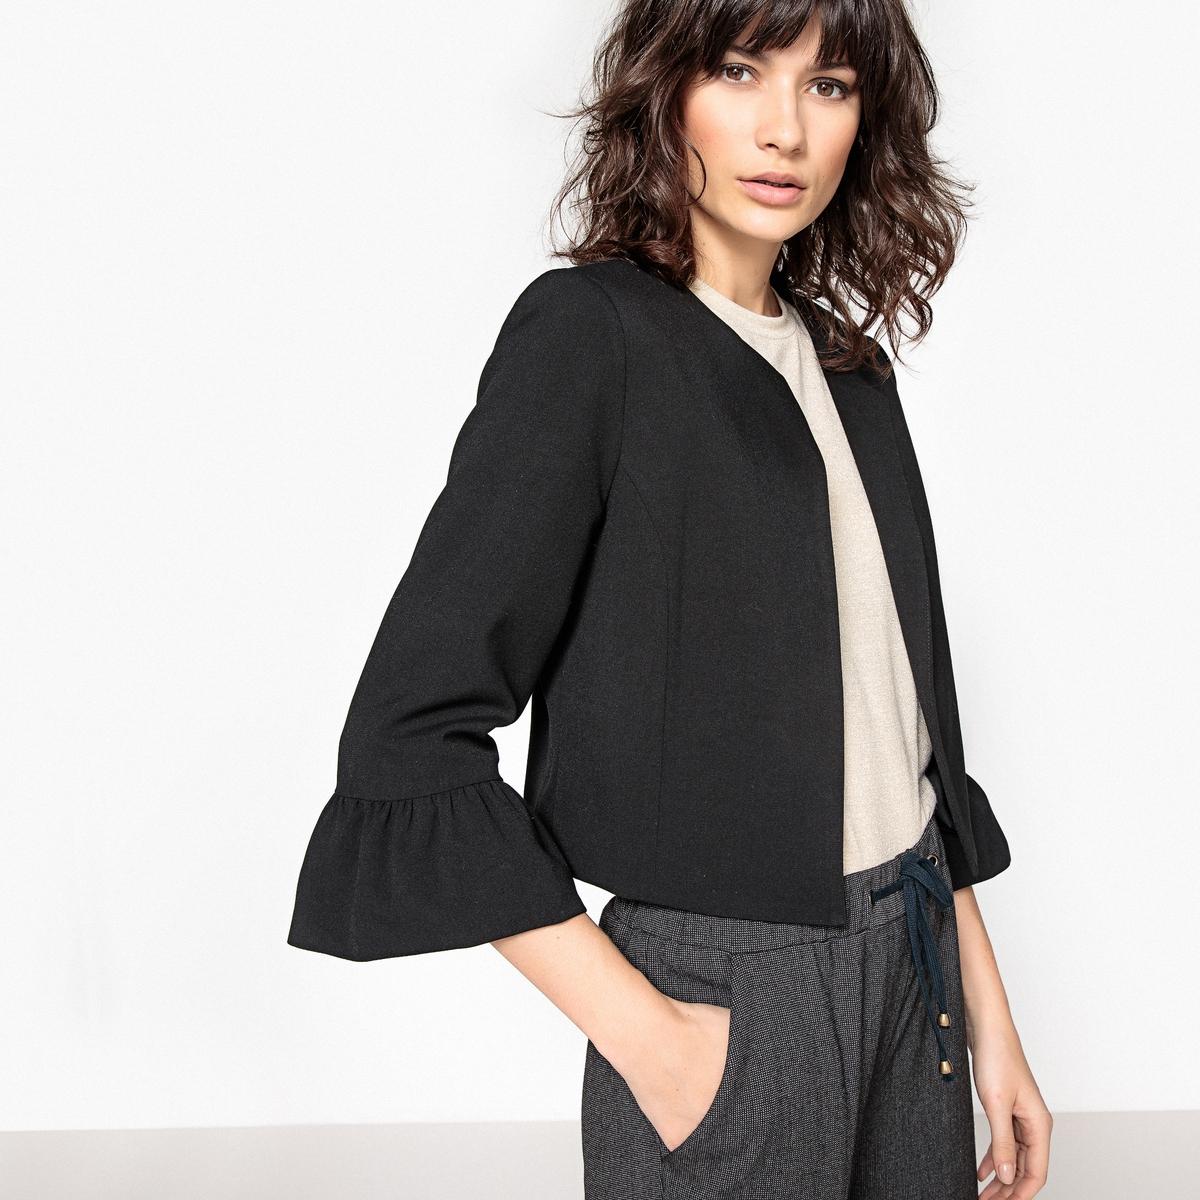 Жакет короткий с воланами на рукавах stylish scoop neck striped beauty pattern short sleeve t shirt for women